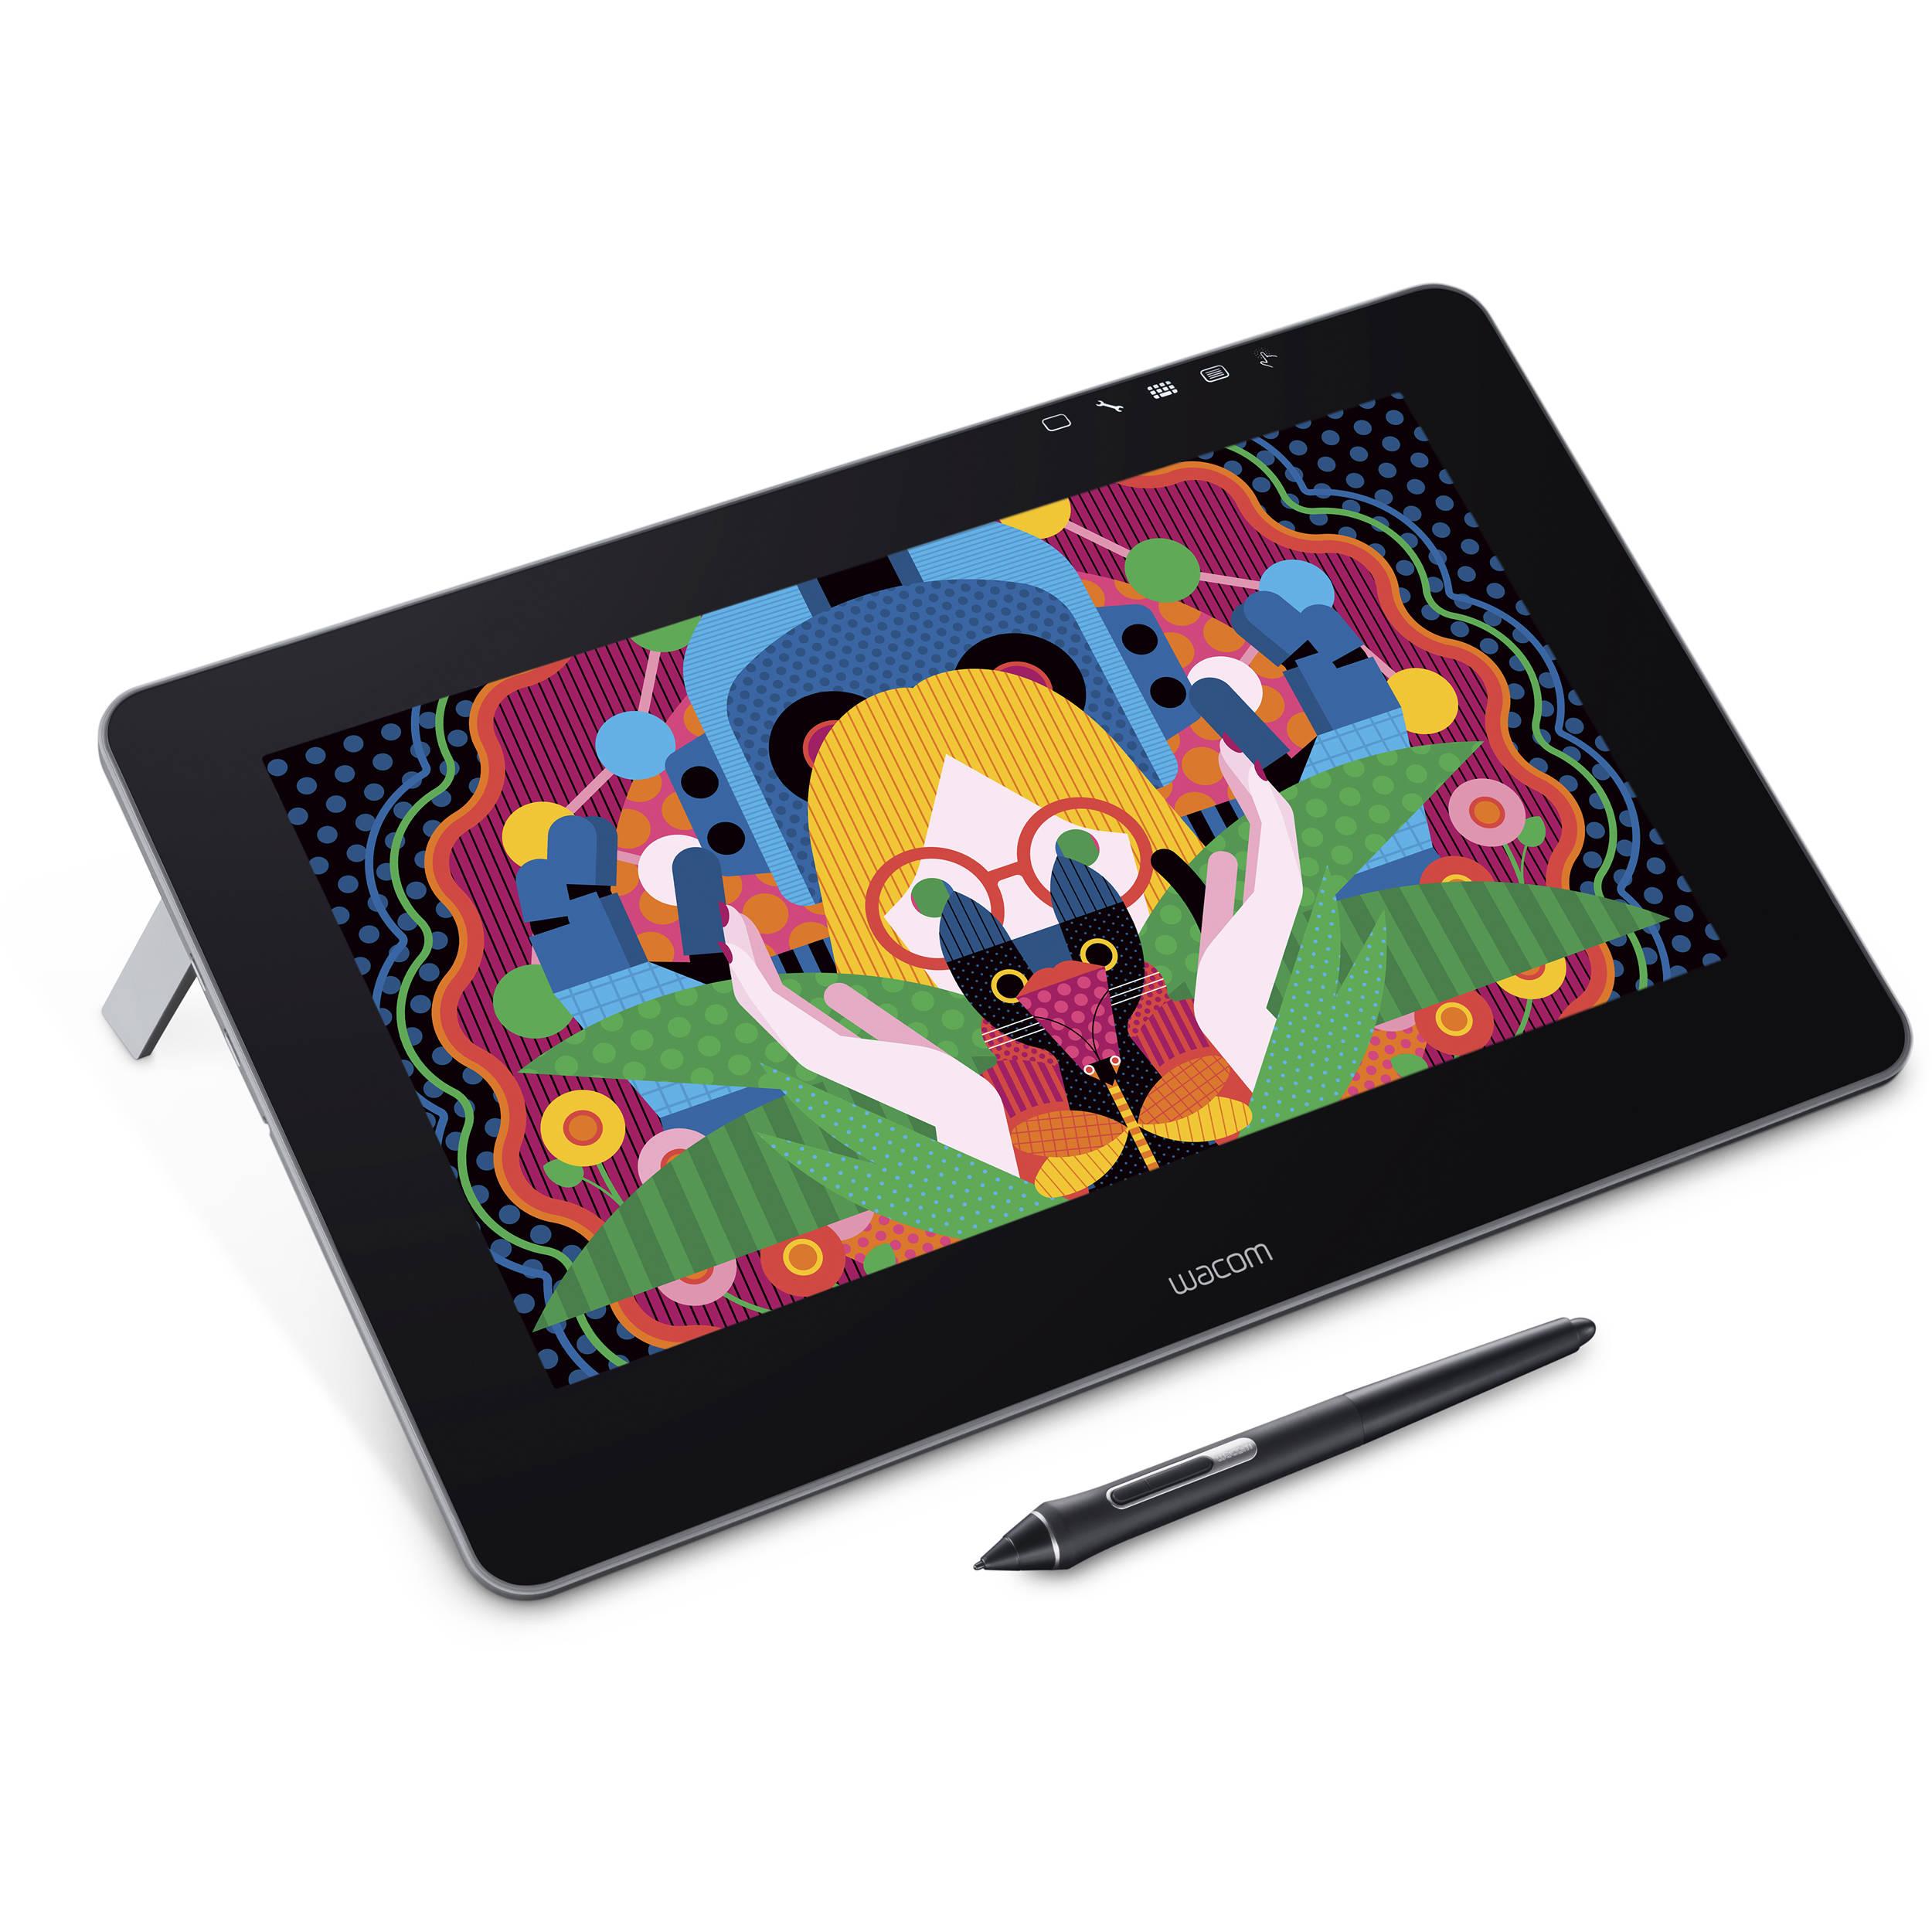 WacomCintiq Pro 13 Creative Pen & Touch Display